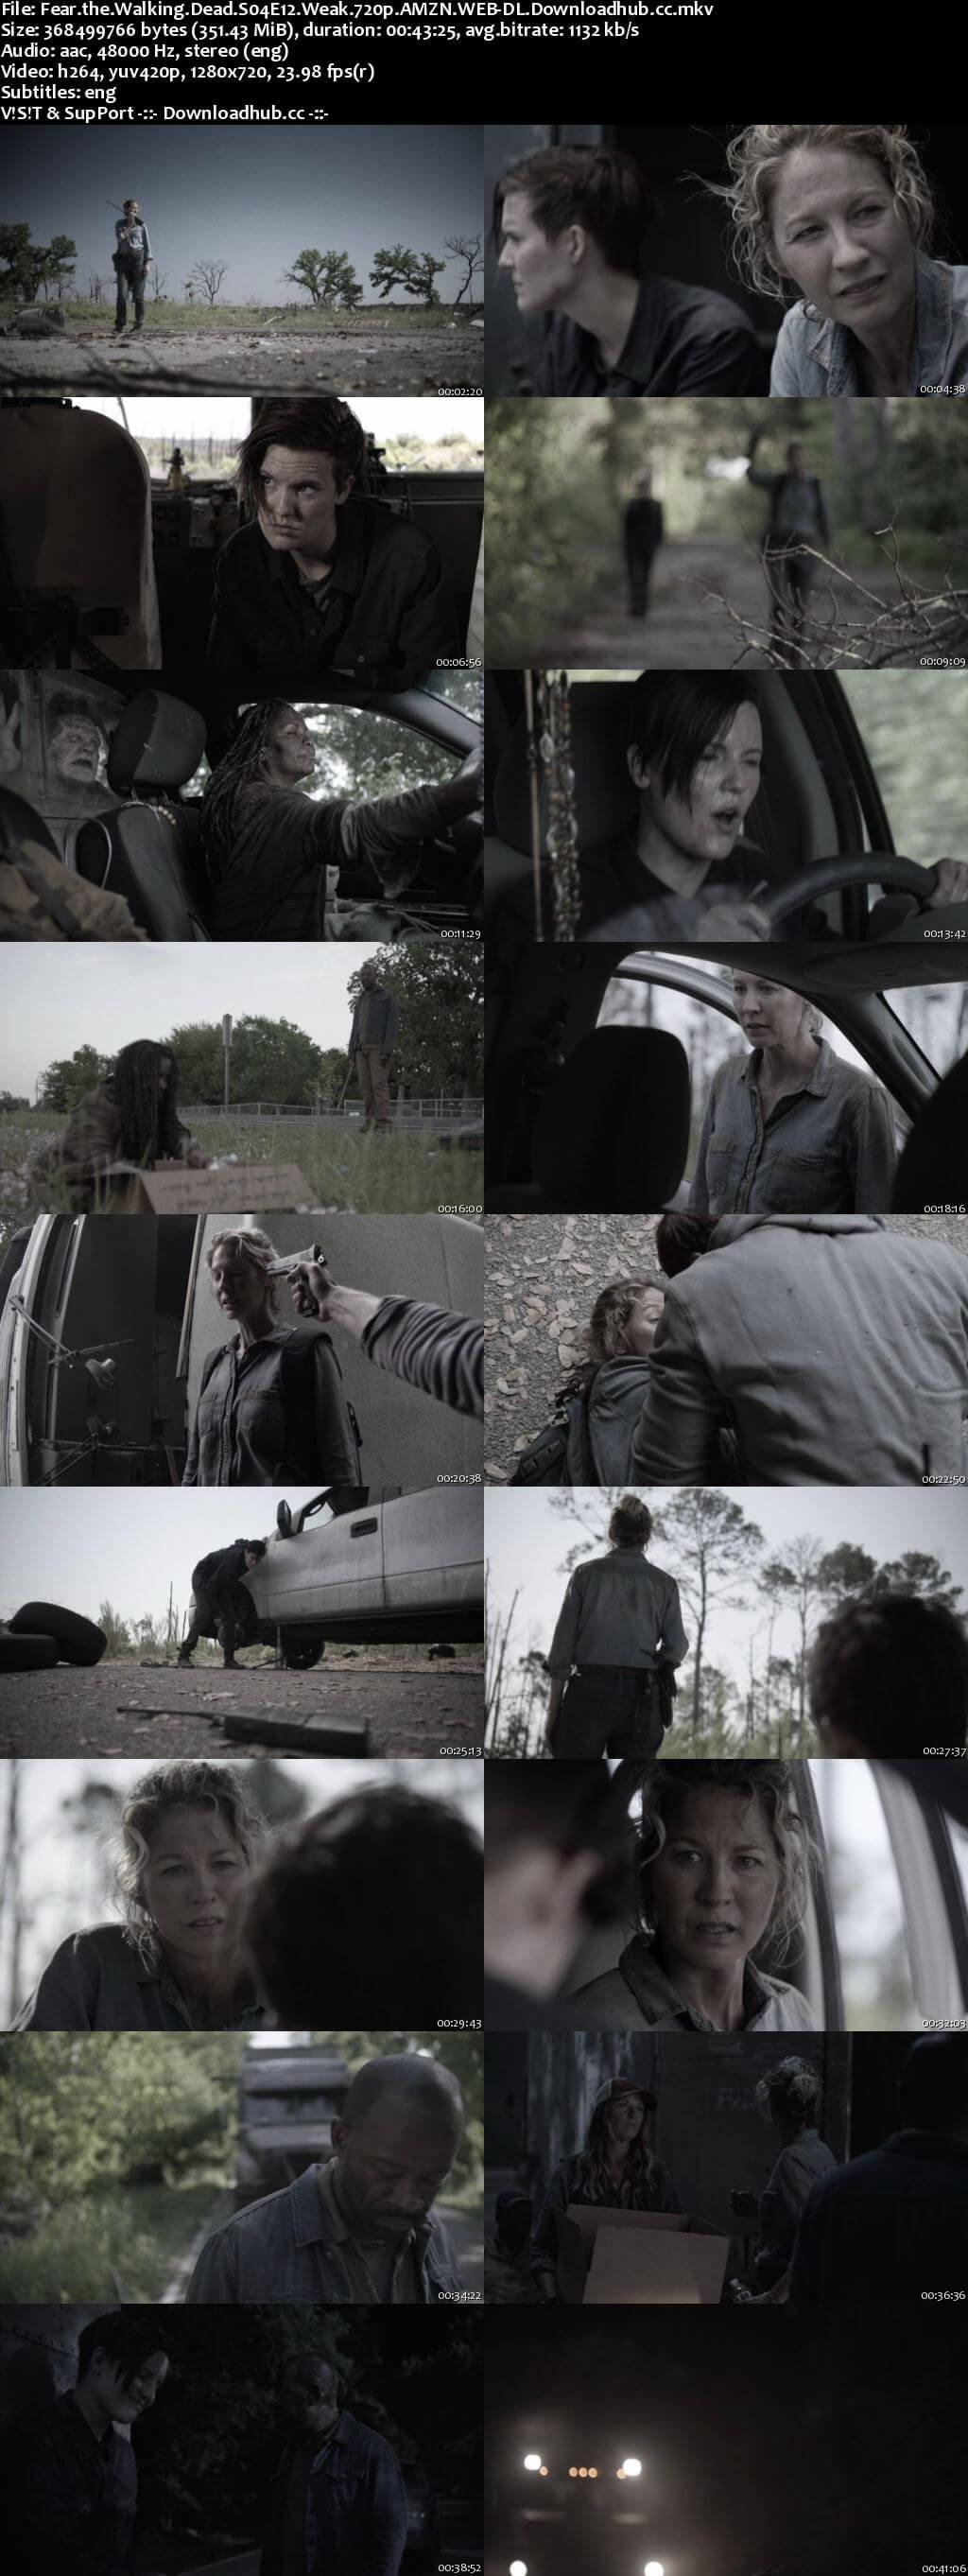 Fear the Walking Dead S04E12 350MB WEBRip 720p x264 ESubs